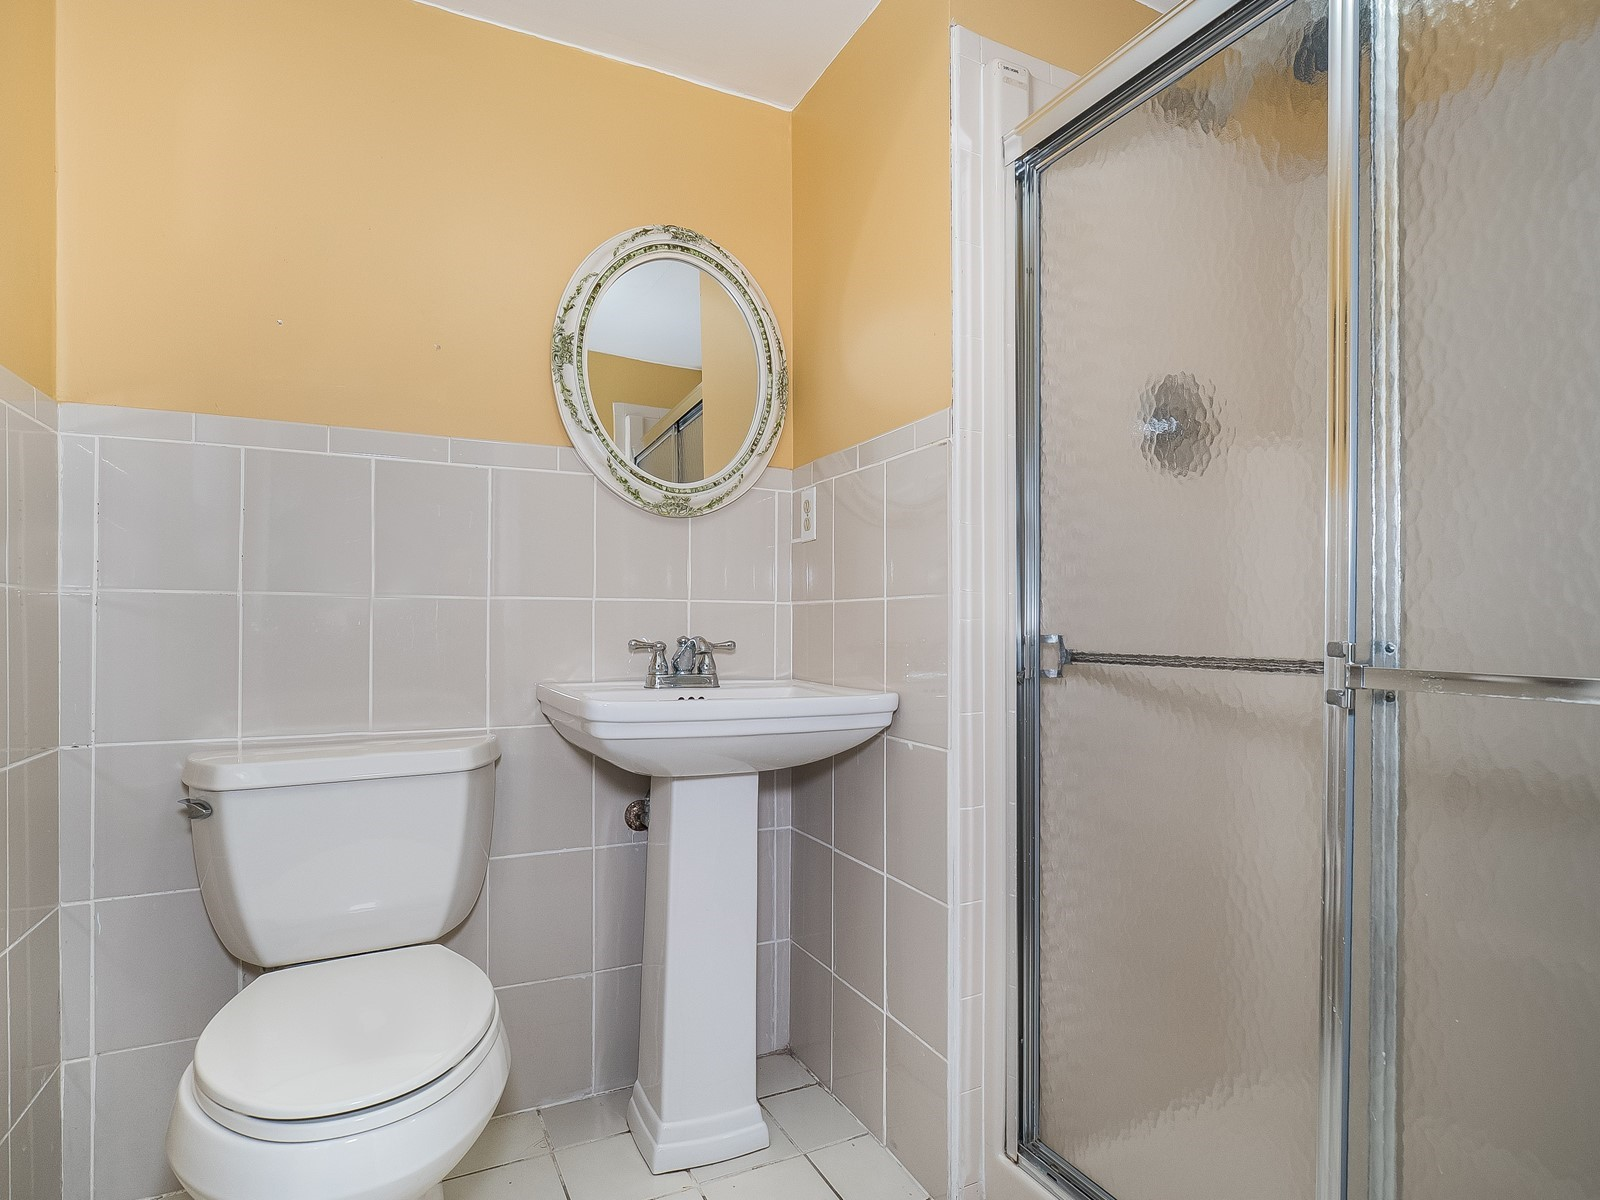 Woodbridge 29 Temporary Housing bathroom